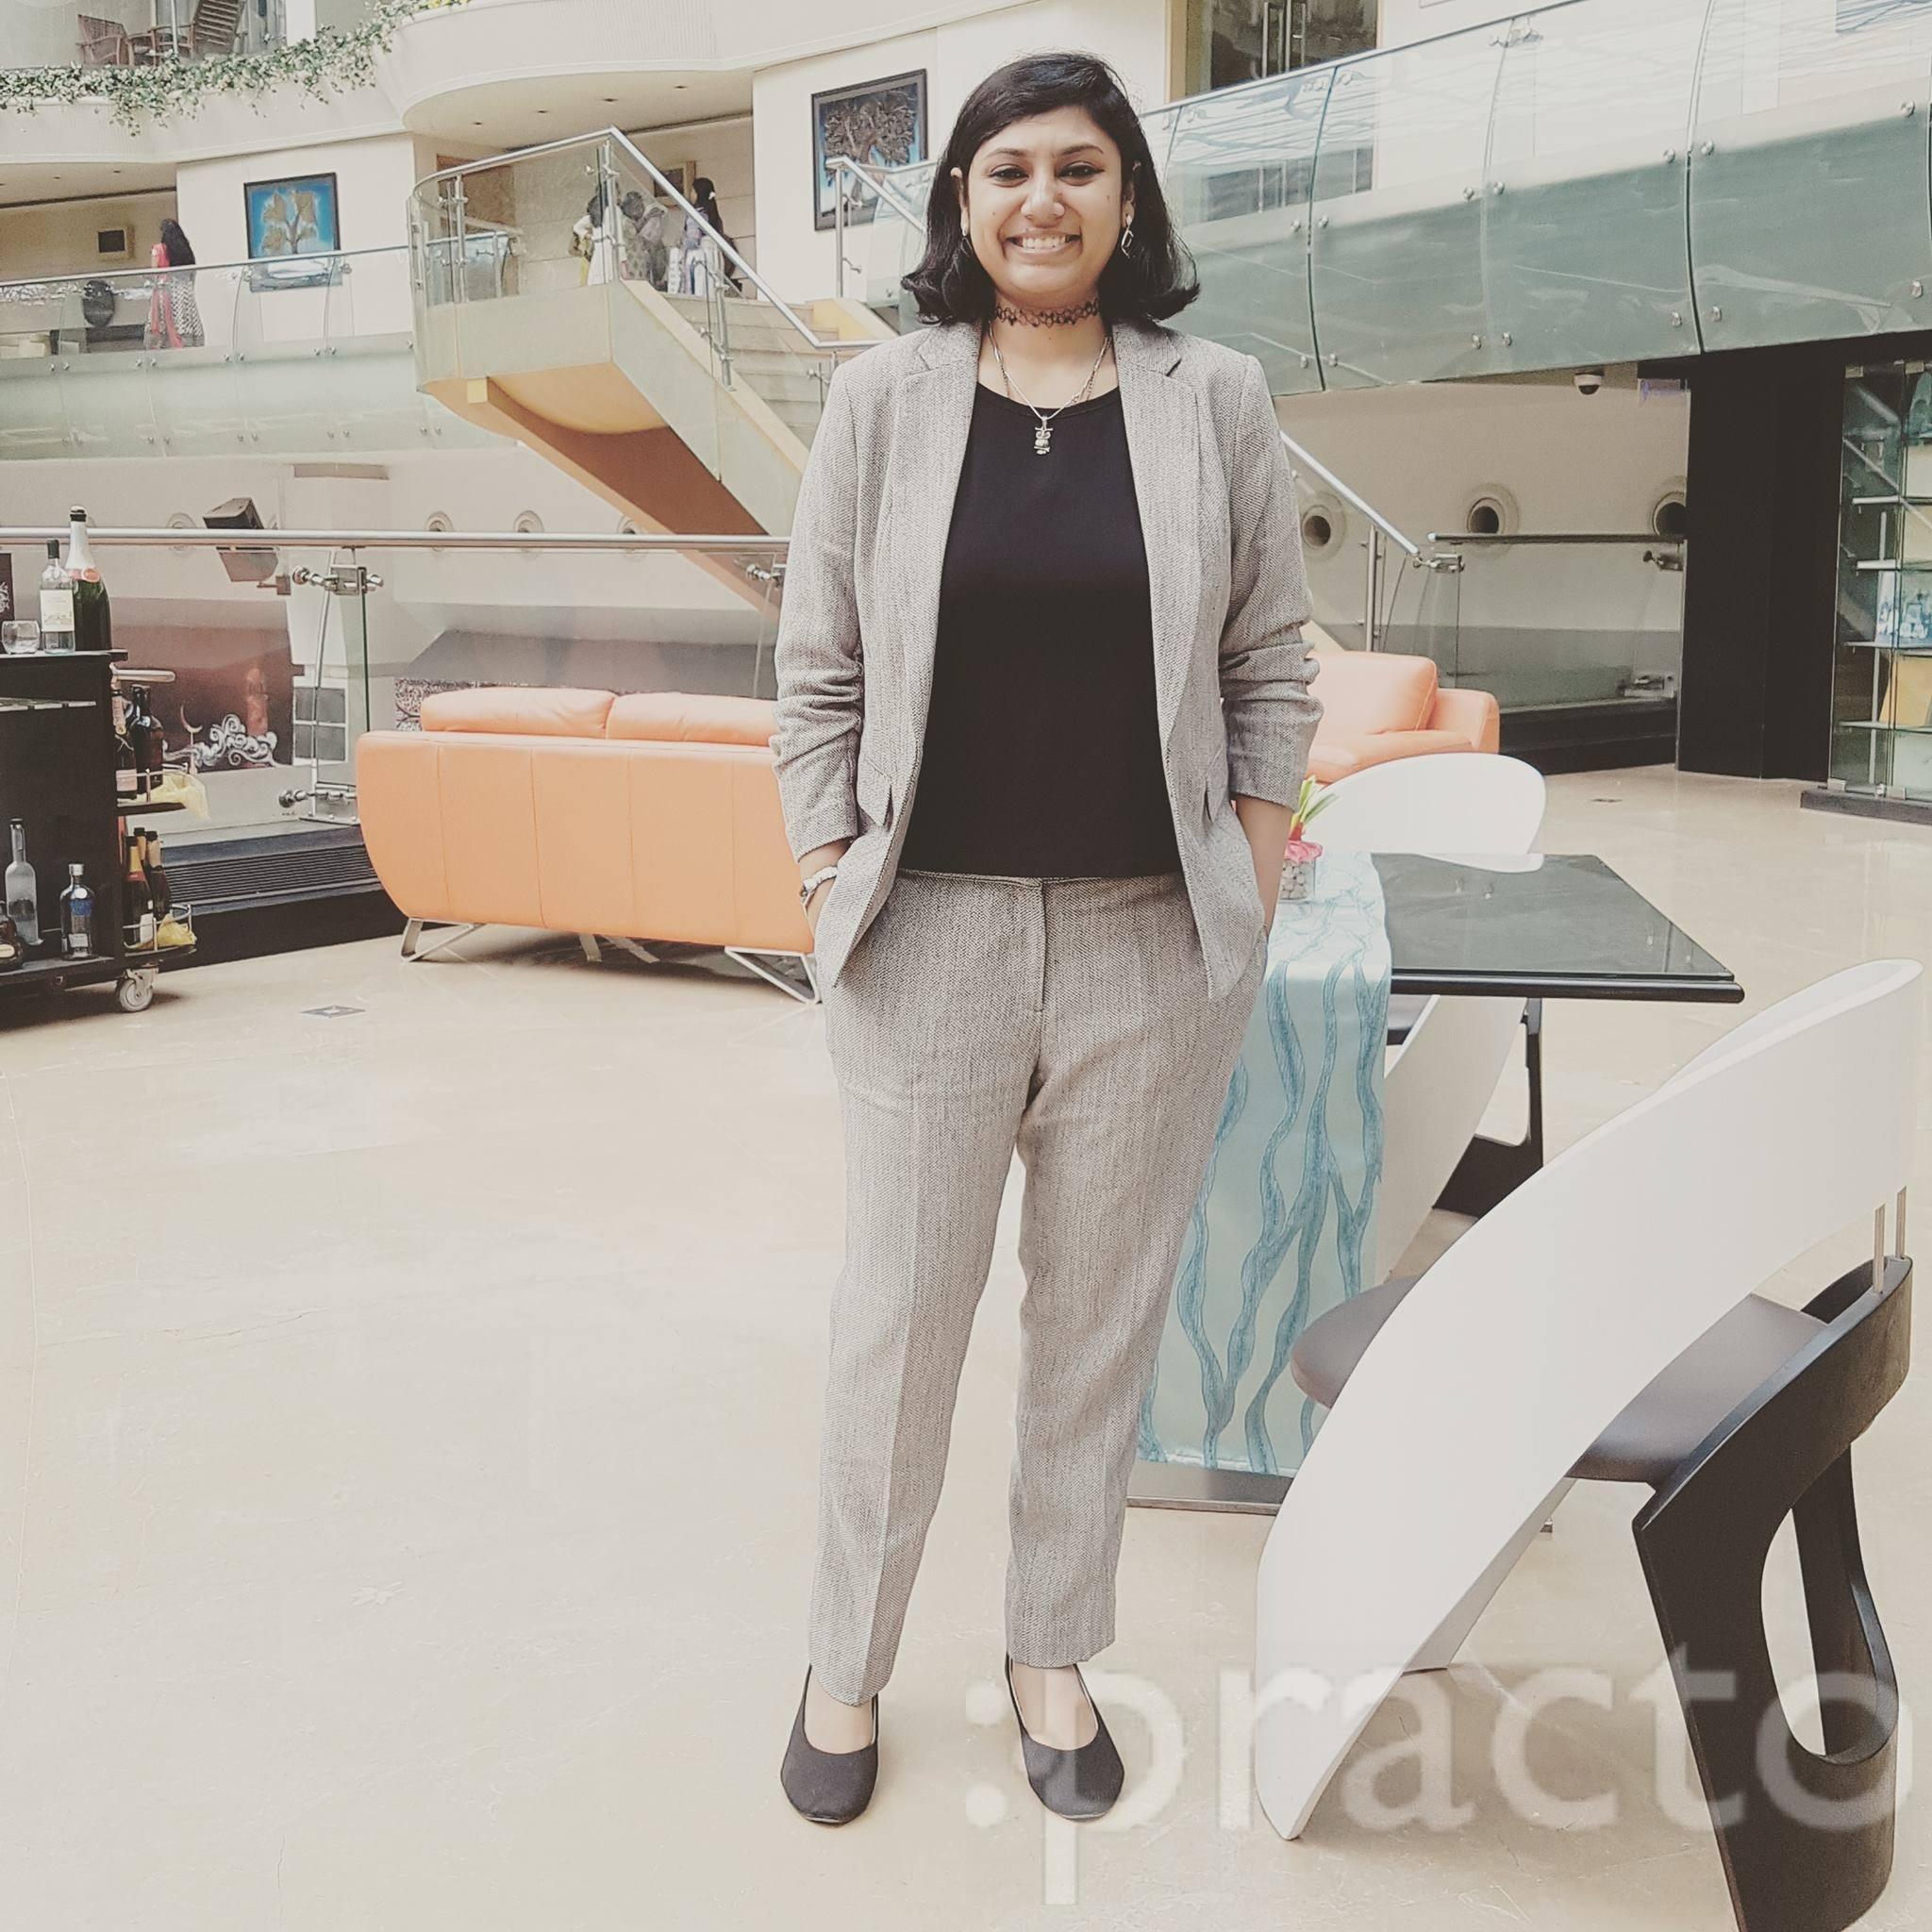 Ms. Akshita Aggarwal - Dietitian/Nutritionist